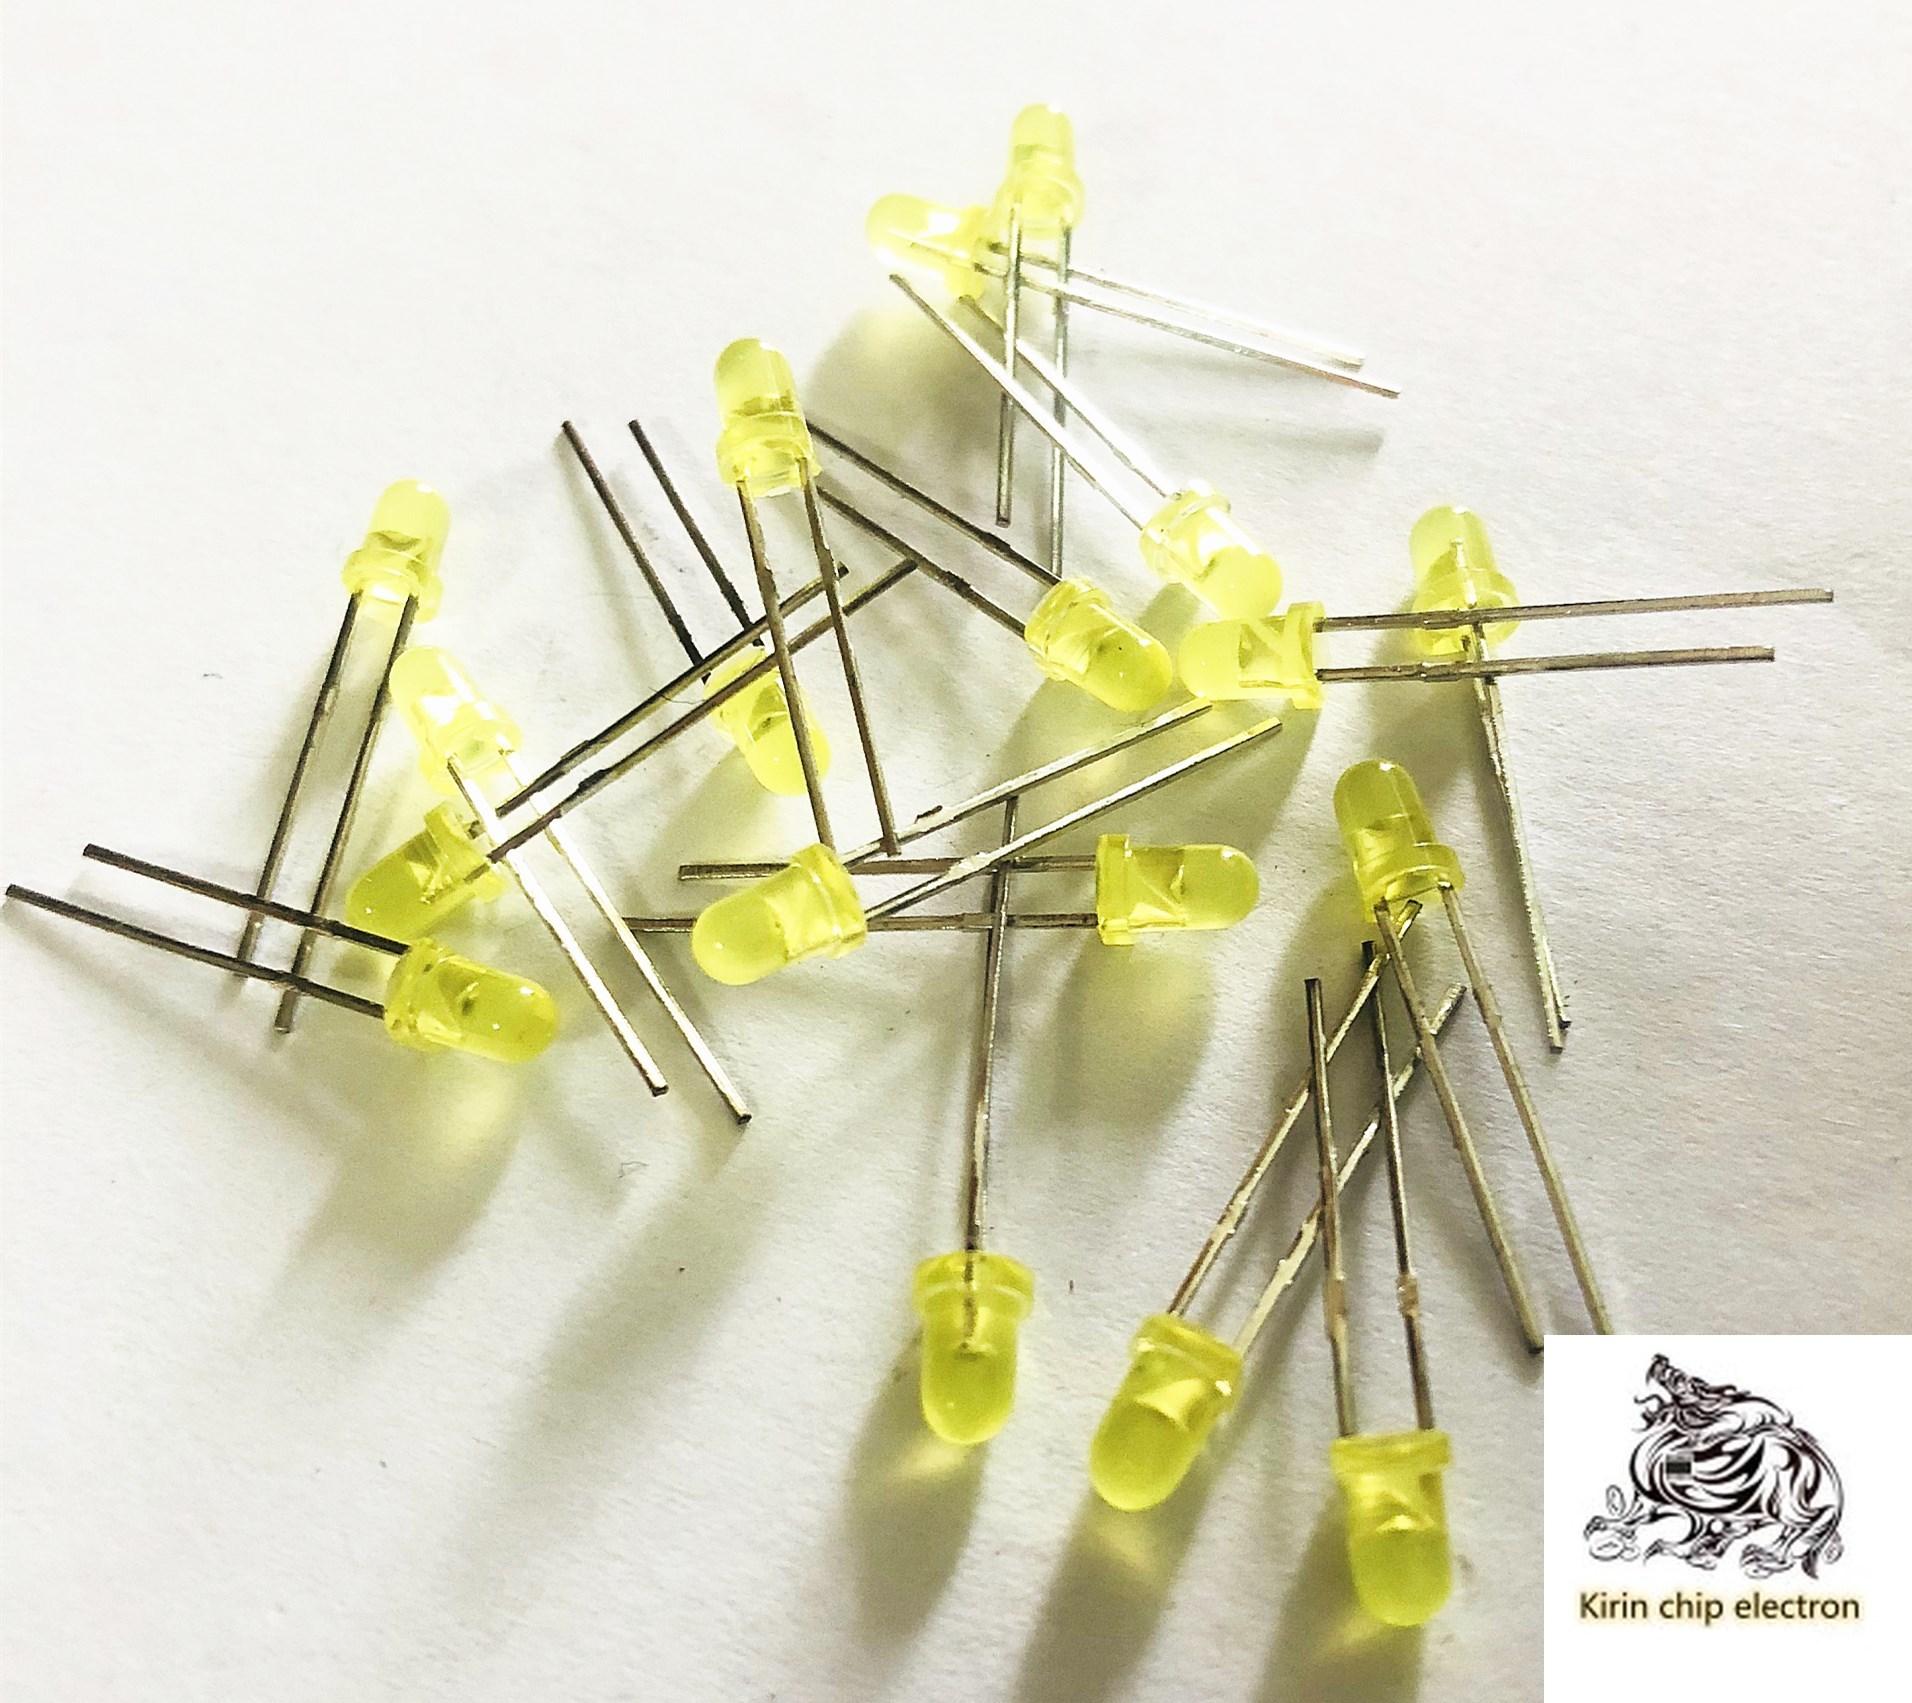 1000PCS/LOT LED Shining Diode 3mm Yellow Light 3mm Yellow Yellow Highlight Short Feet 3mm